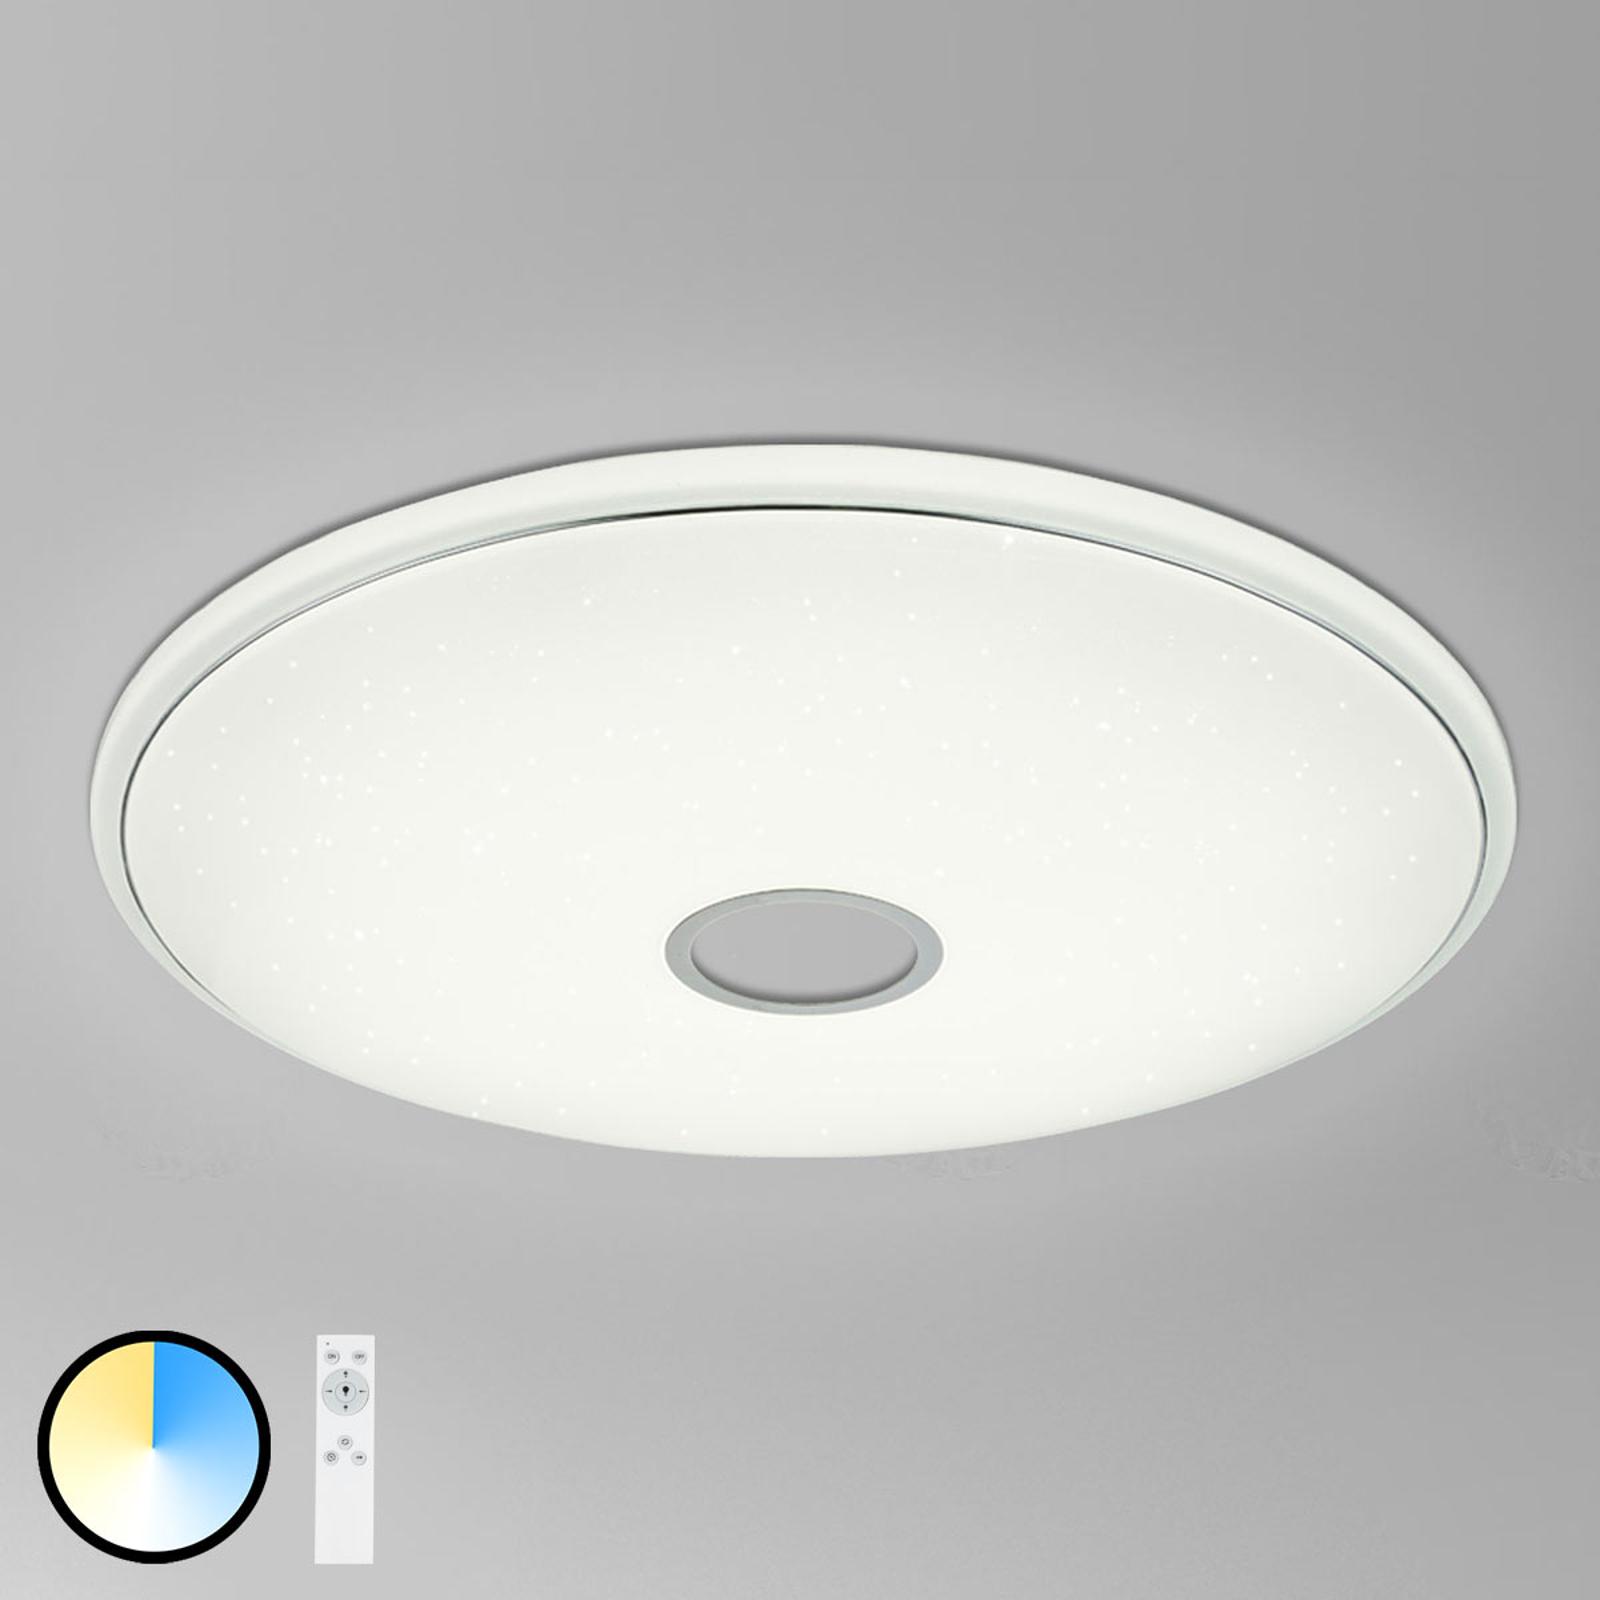 LED plafondlamp Connor met afstandsbediening